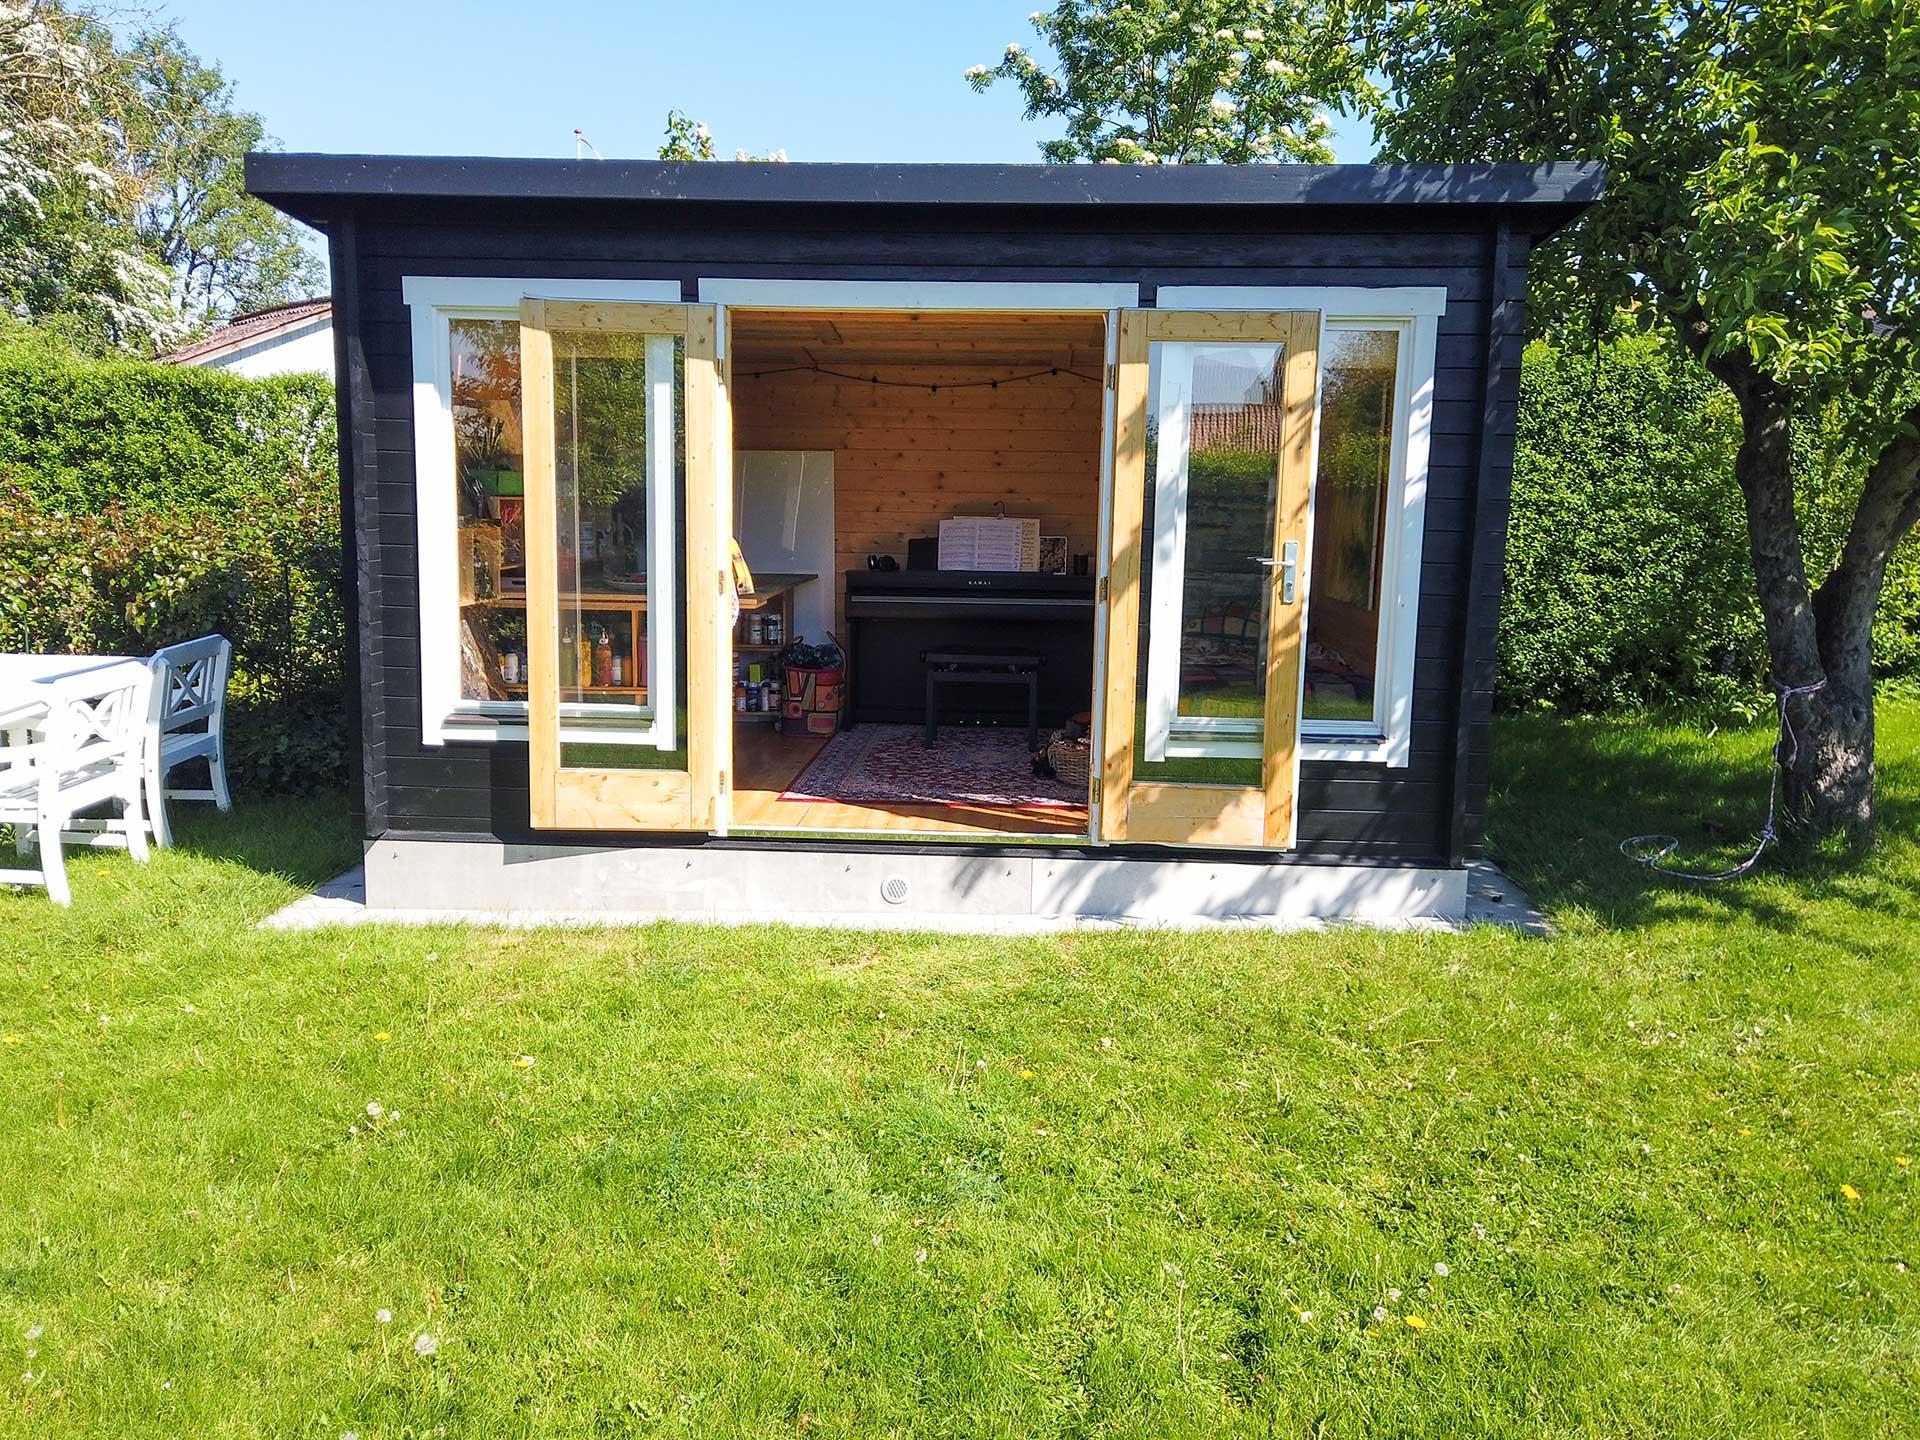 12 m2 havehus / lysthus fra www.sølundhuse.dk